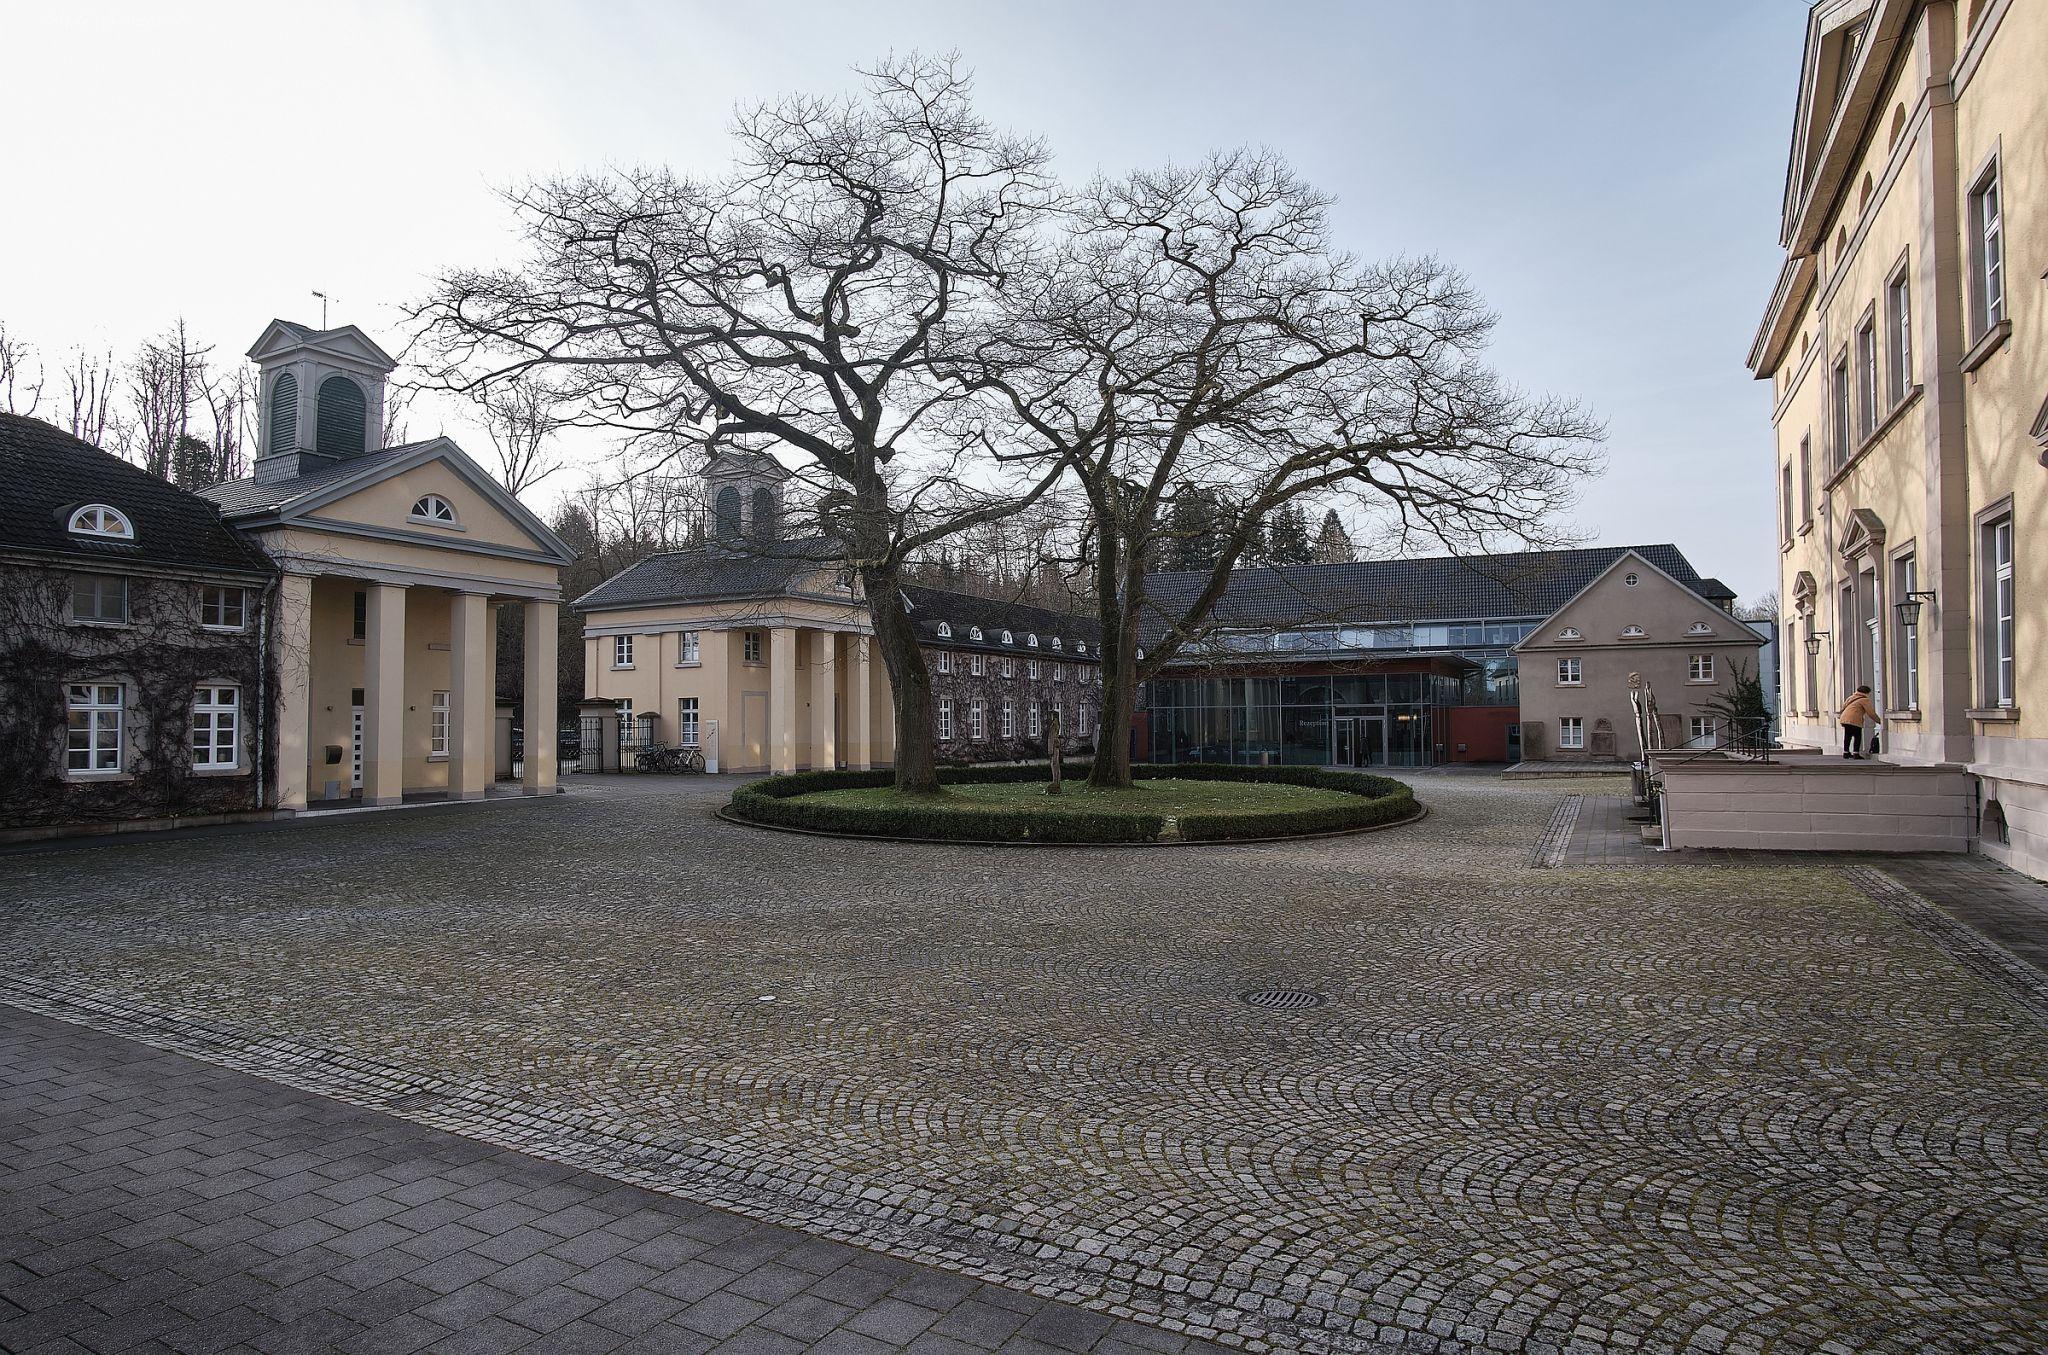 Haus Villigst, Germany